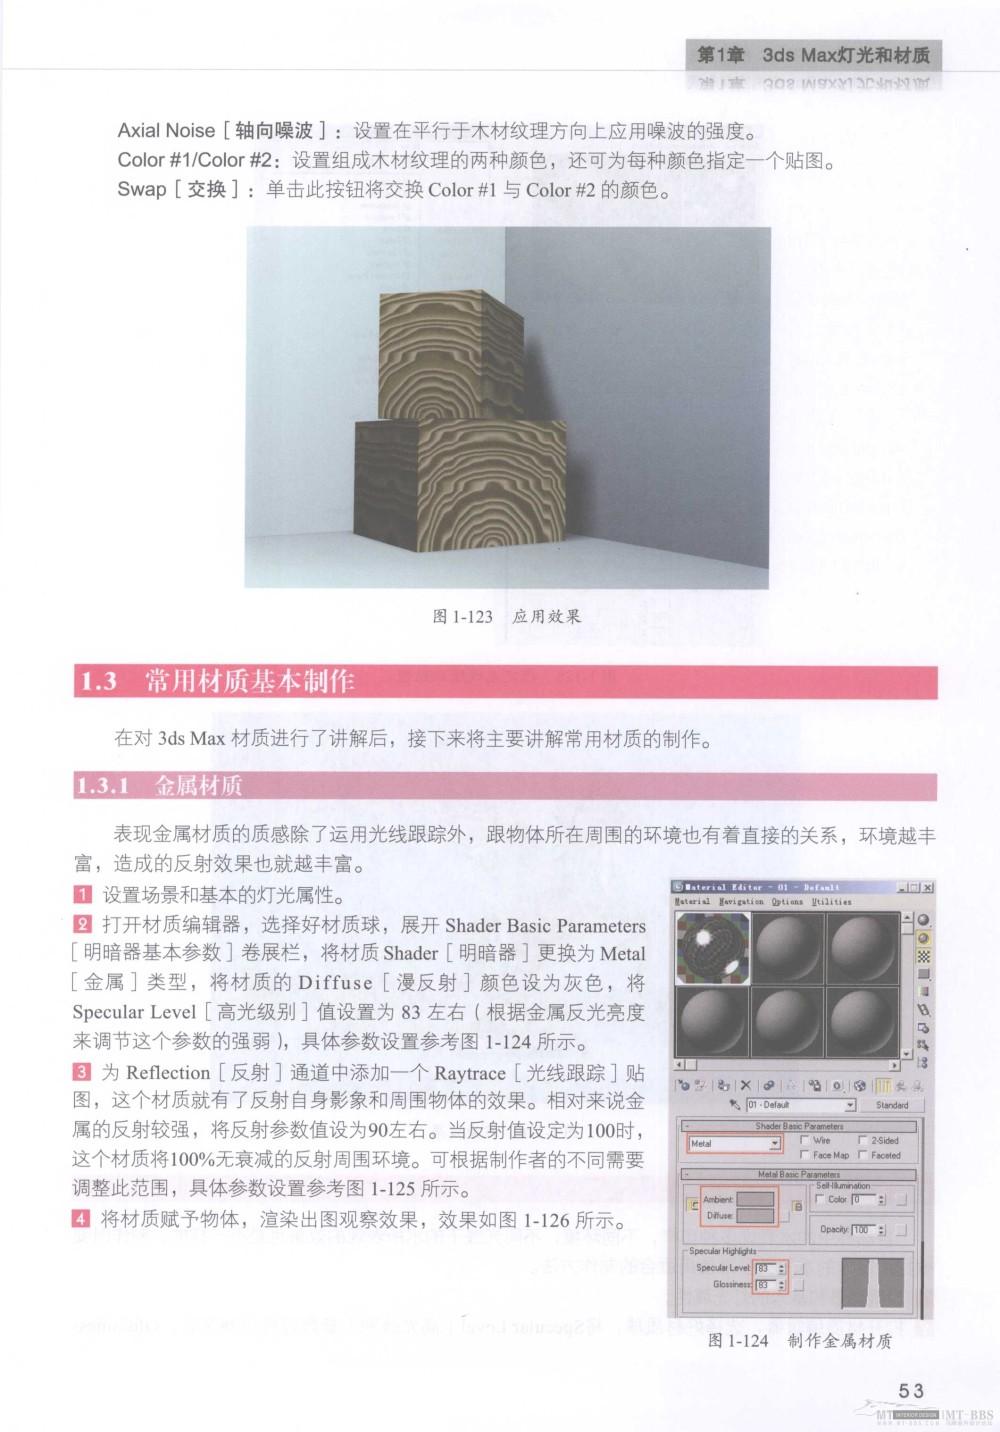 水晶石技法-3ds_Max&VRay室内空间表现_水晶石技法-3ds_Max&VRay室内空间表现_页面_059.jpg